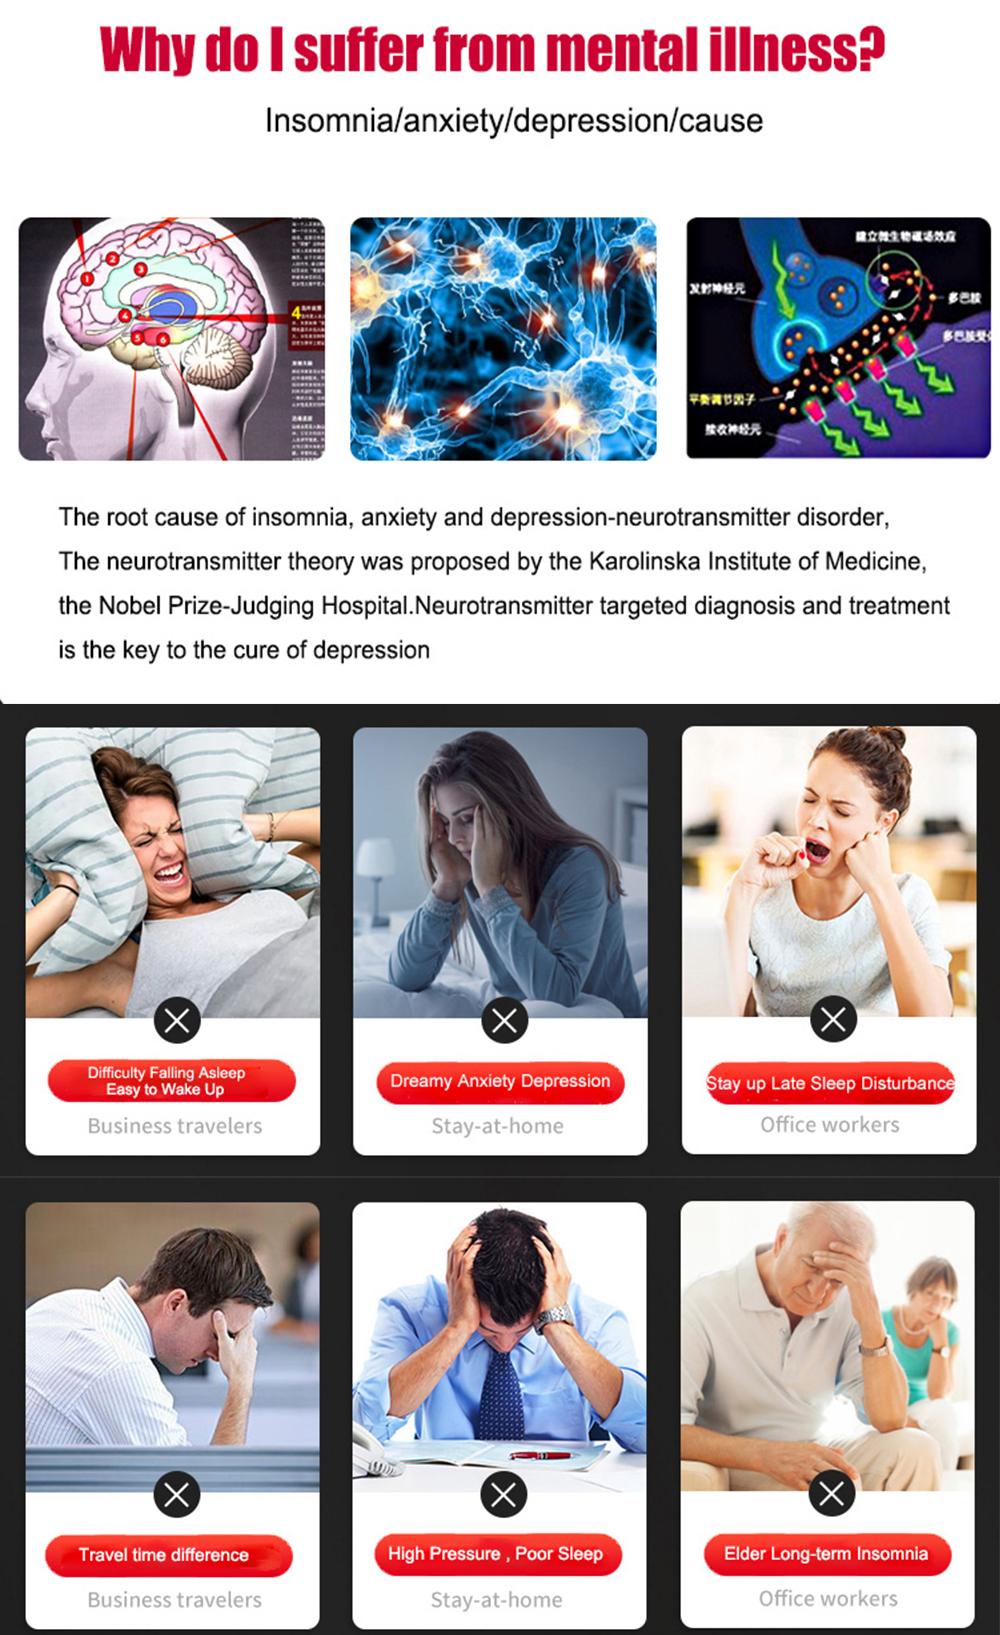 Reasons of Mental Illness and Sleeping Disorders